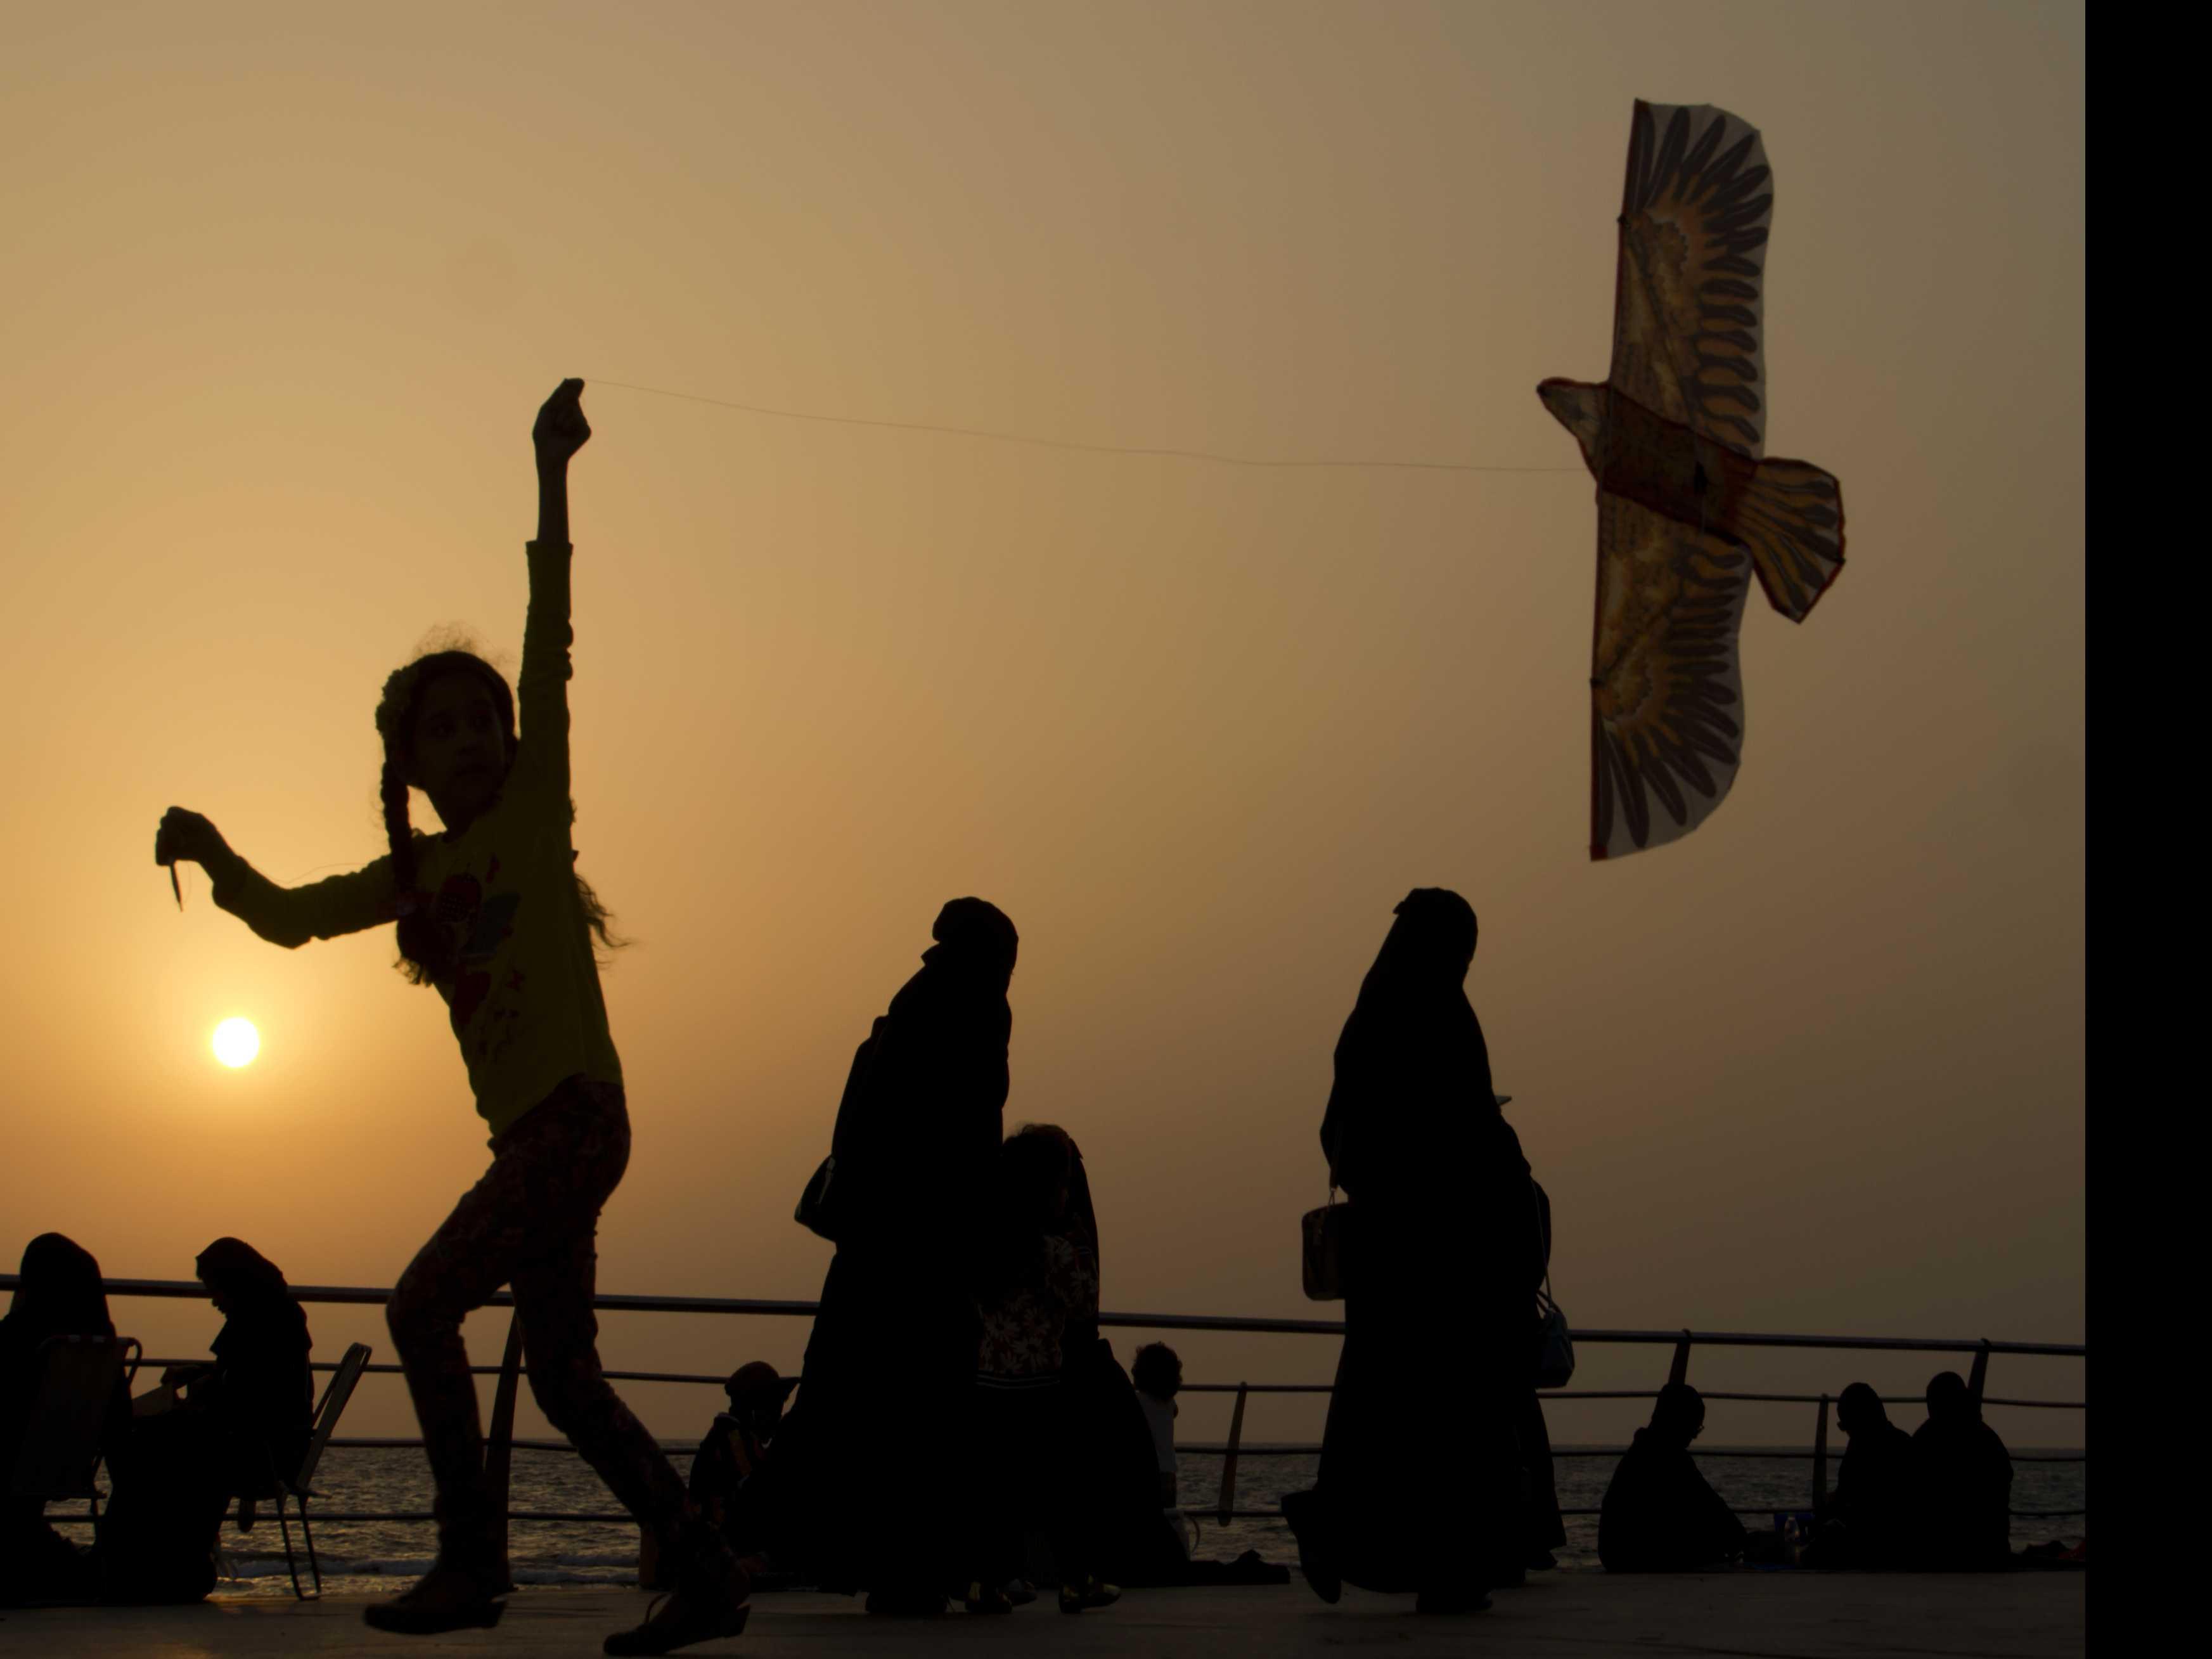 No Visa, No Veil? Saudi Arabia May Ease Rules for Tourists